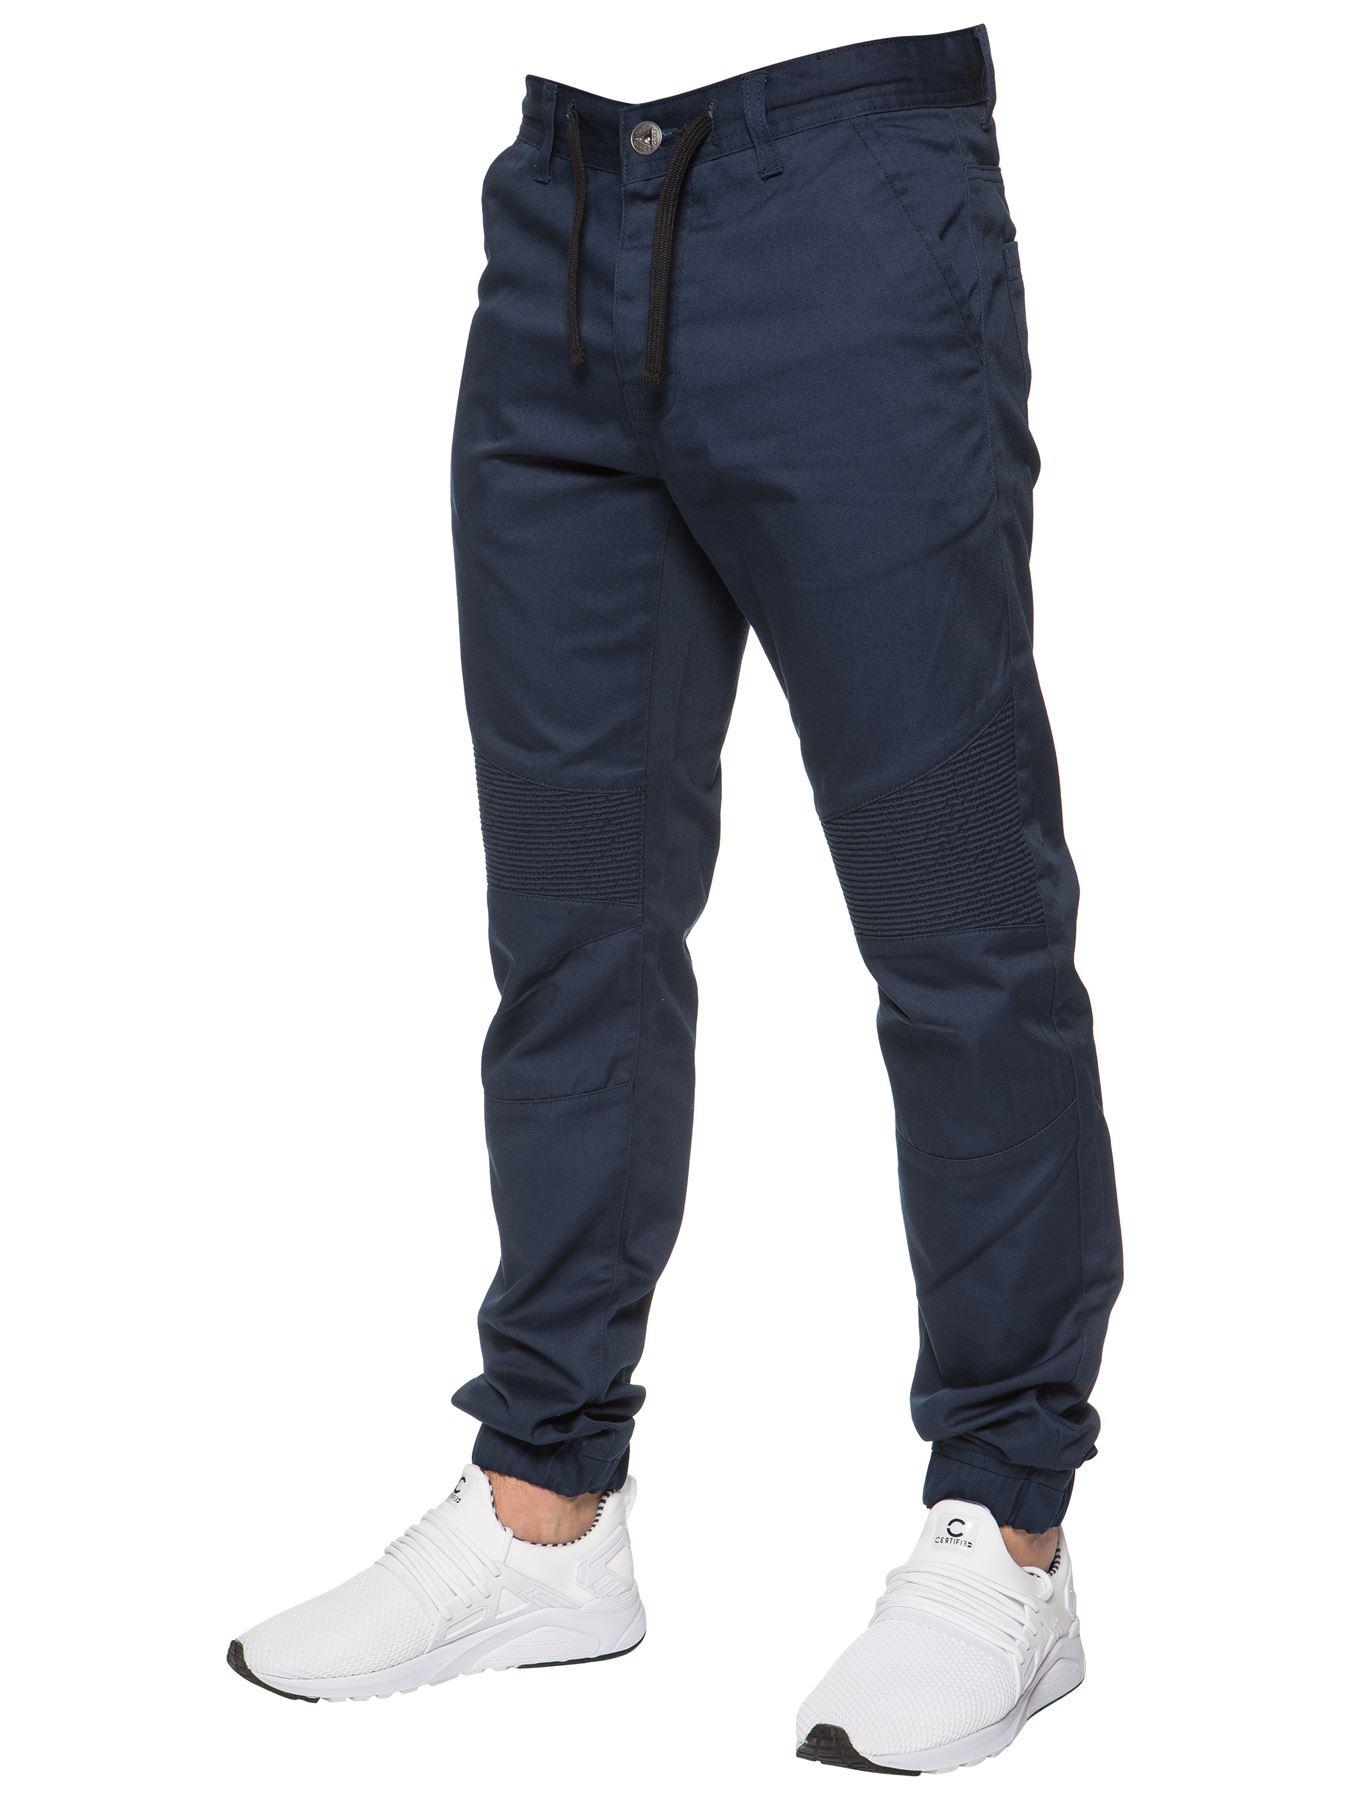 Enzo-Designer-Mens-Cuffed-Chinos-Biker-Jeans-Slim-Denim-Trousers-Pants-Joggers thumbnail 7